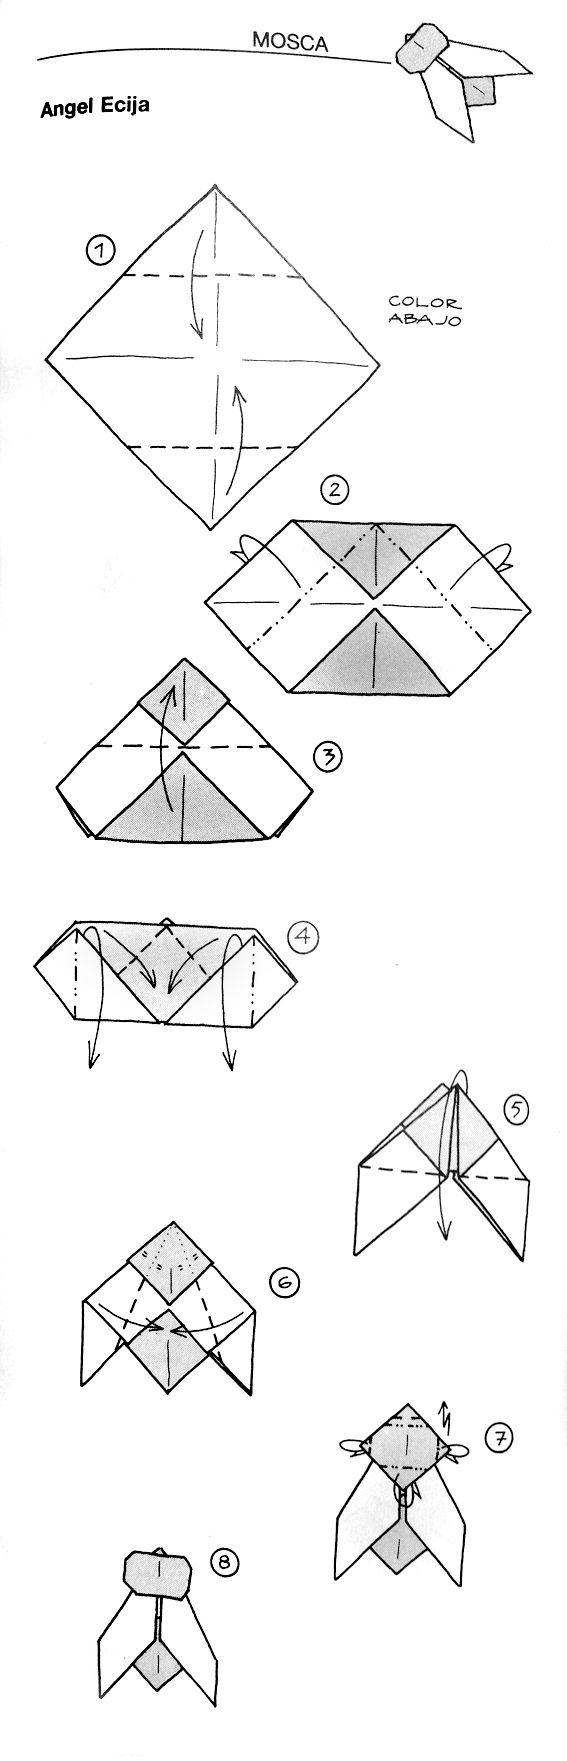 Fly Mosca Origami Papiroflexia Angel Diagrams Paper Kirigami